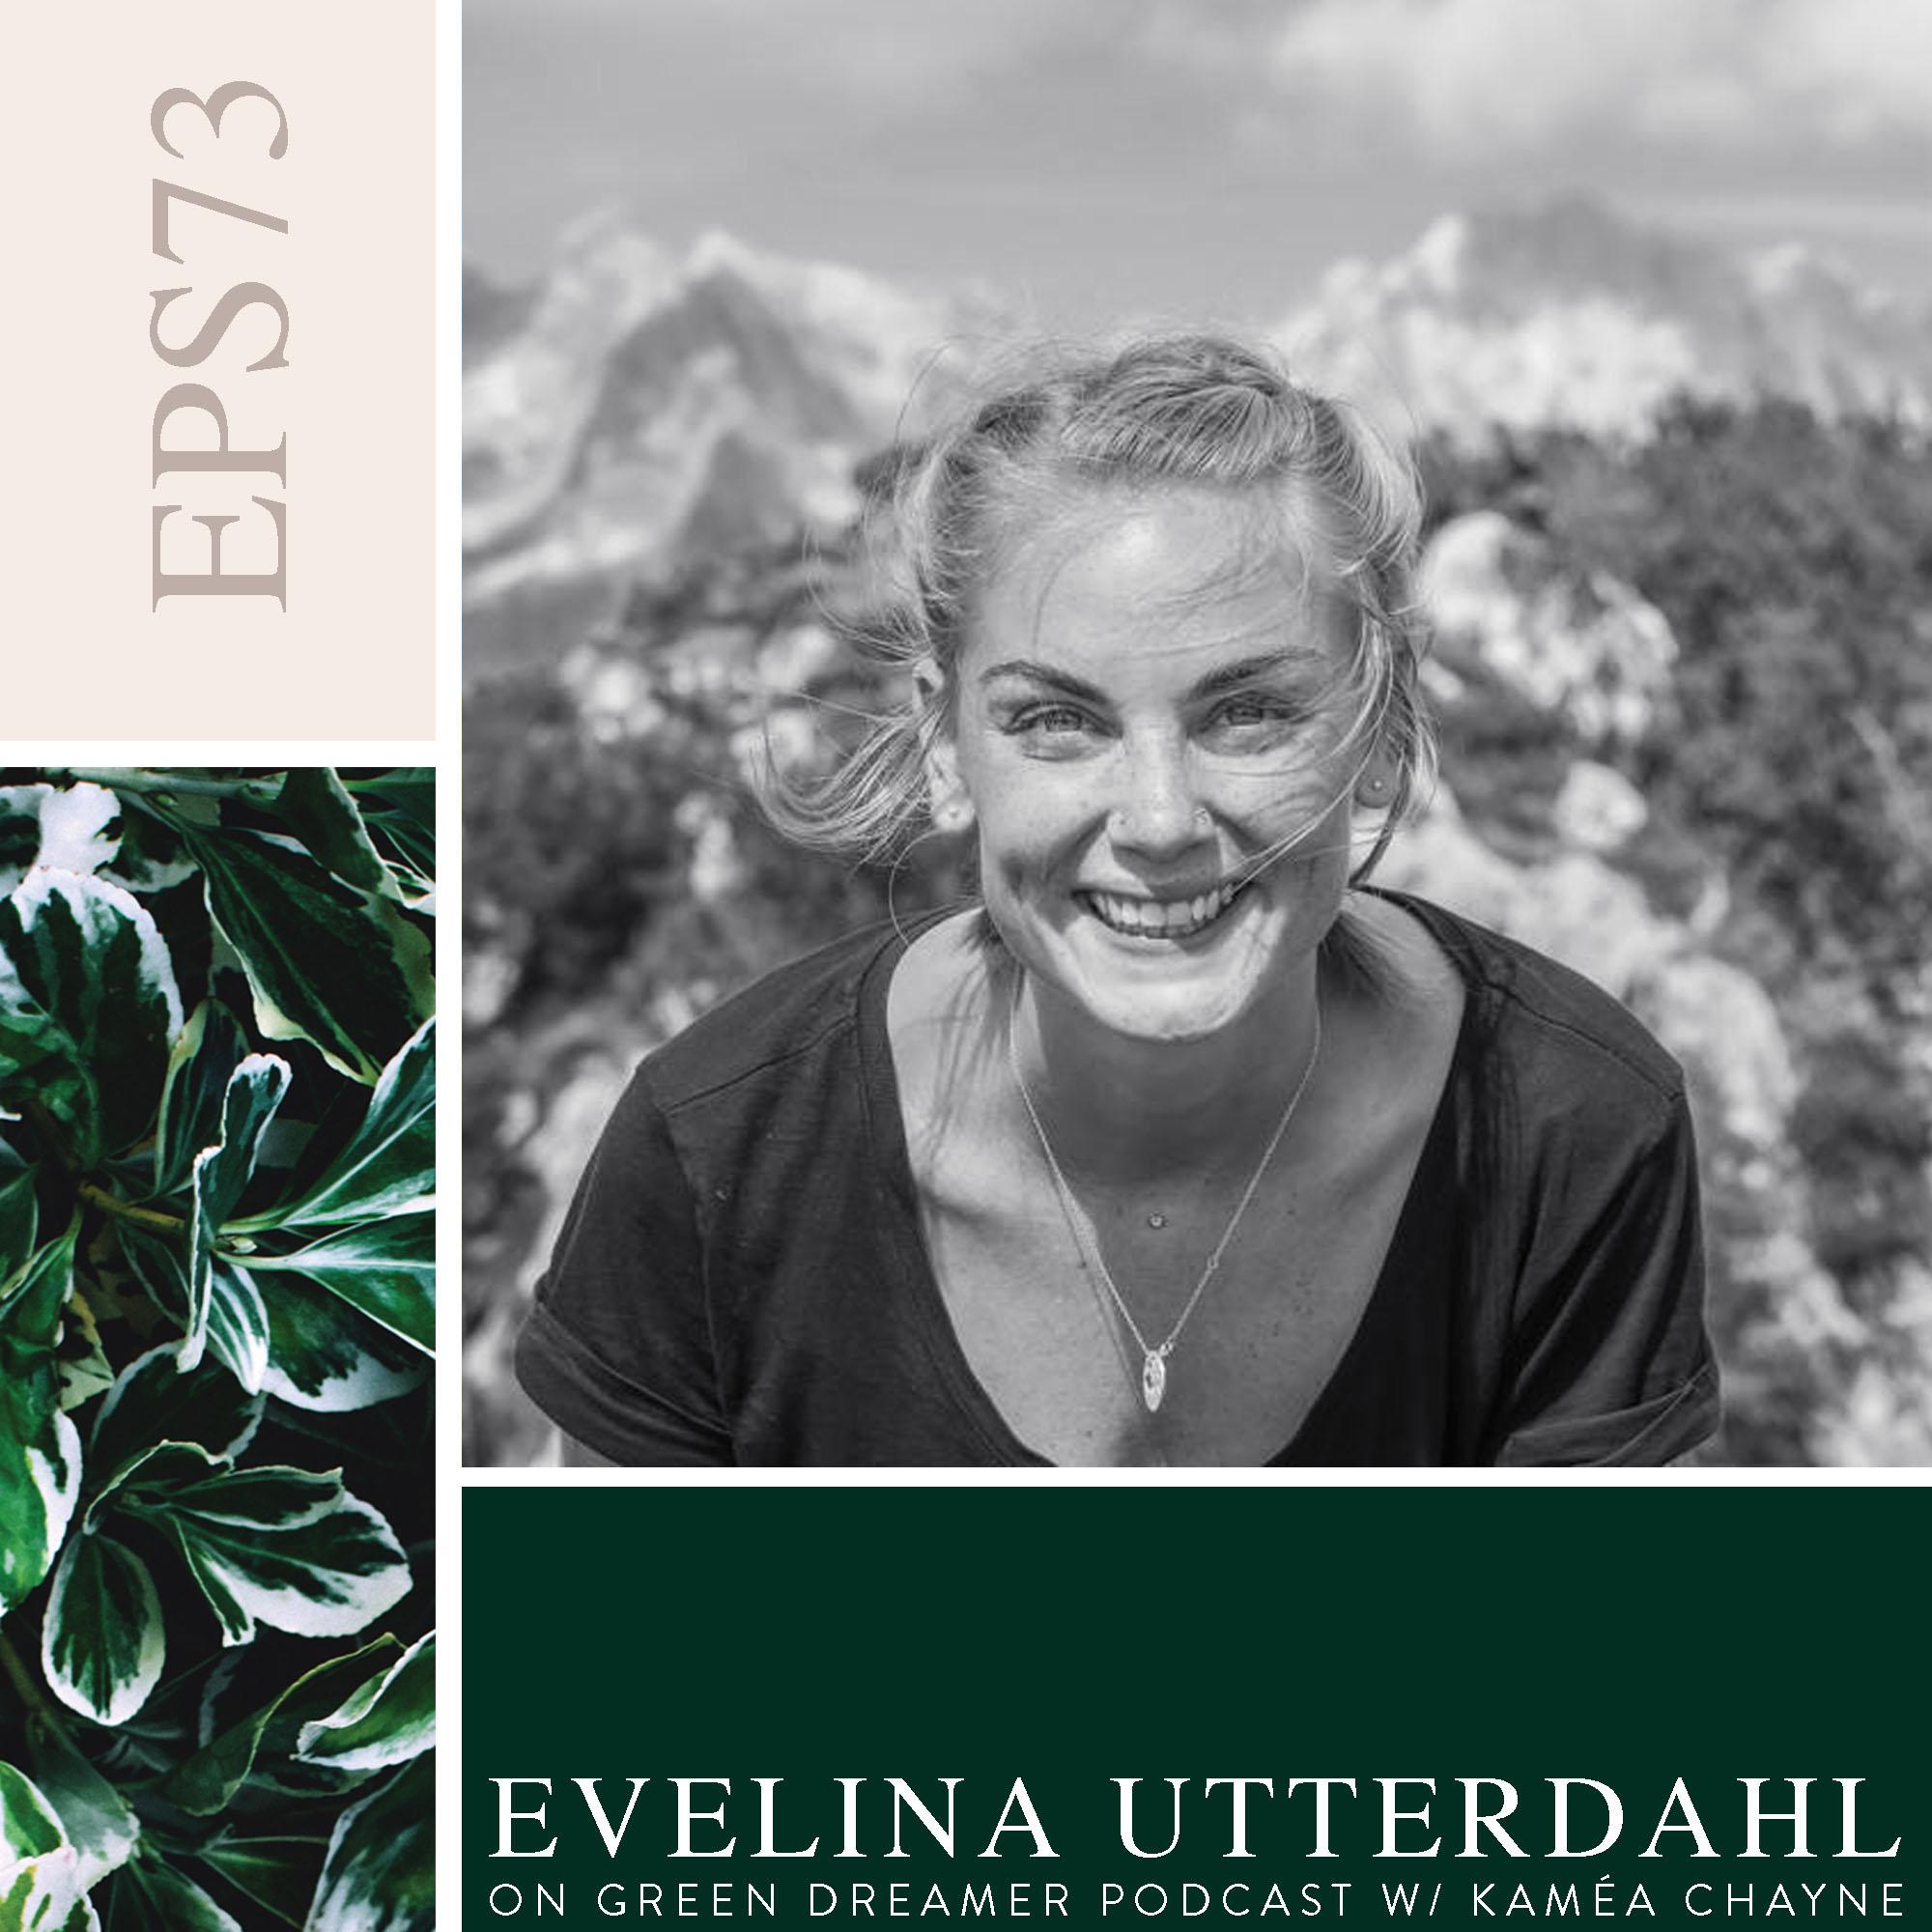 73-Evelina-Utterdahl-of-Earth-Wanderess-talks-sustainability-on-Green-Dreamer-Podcast-with-Kame-Chayne.jpg